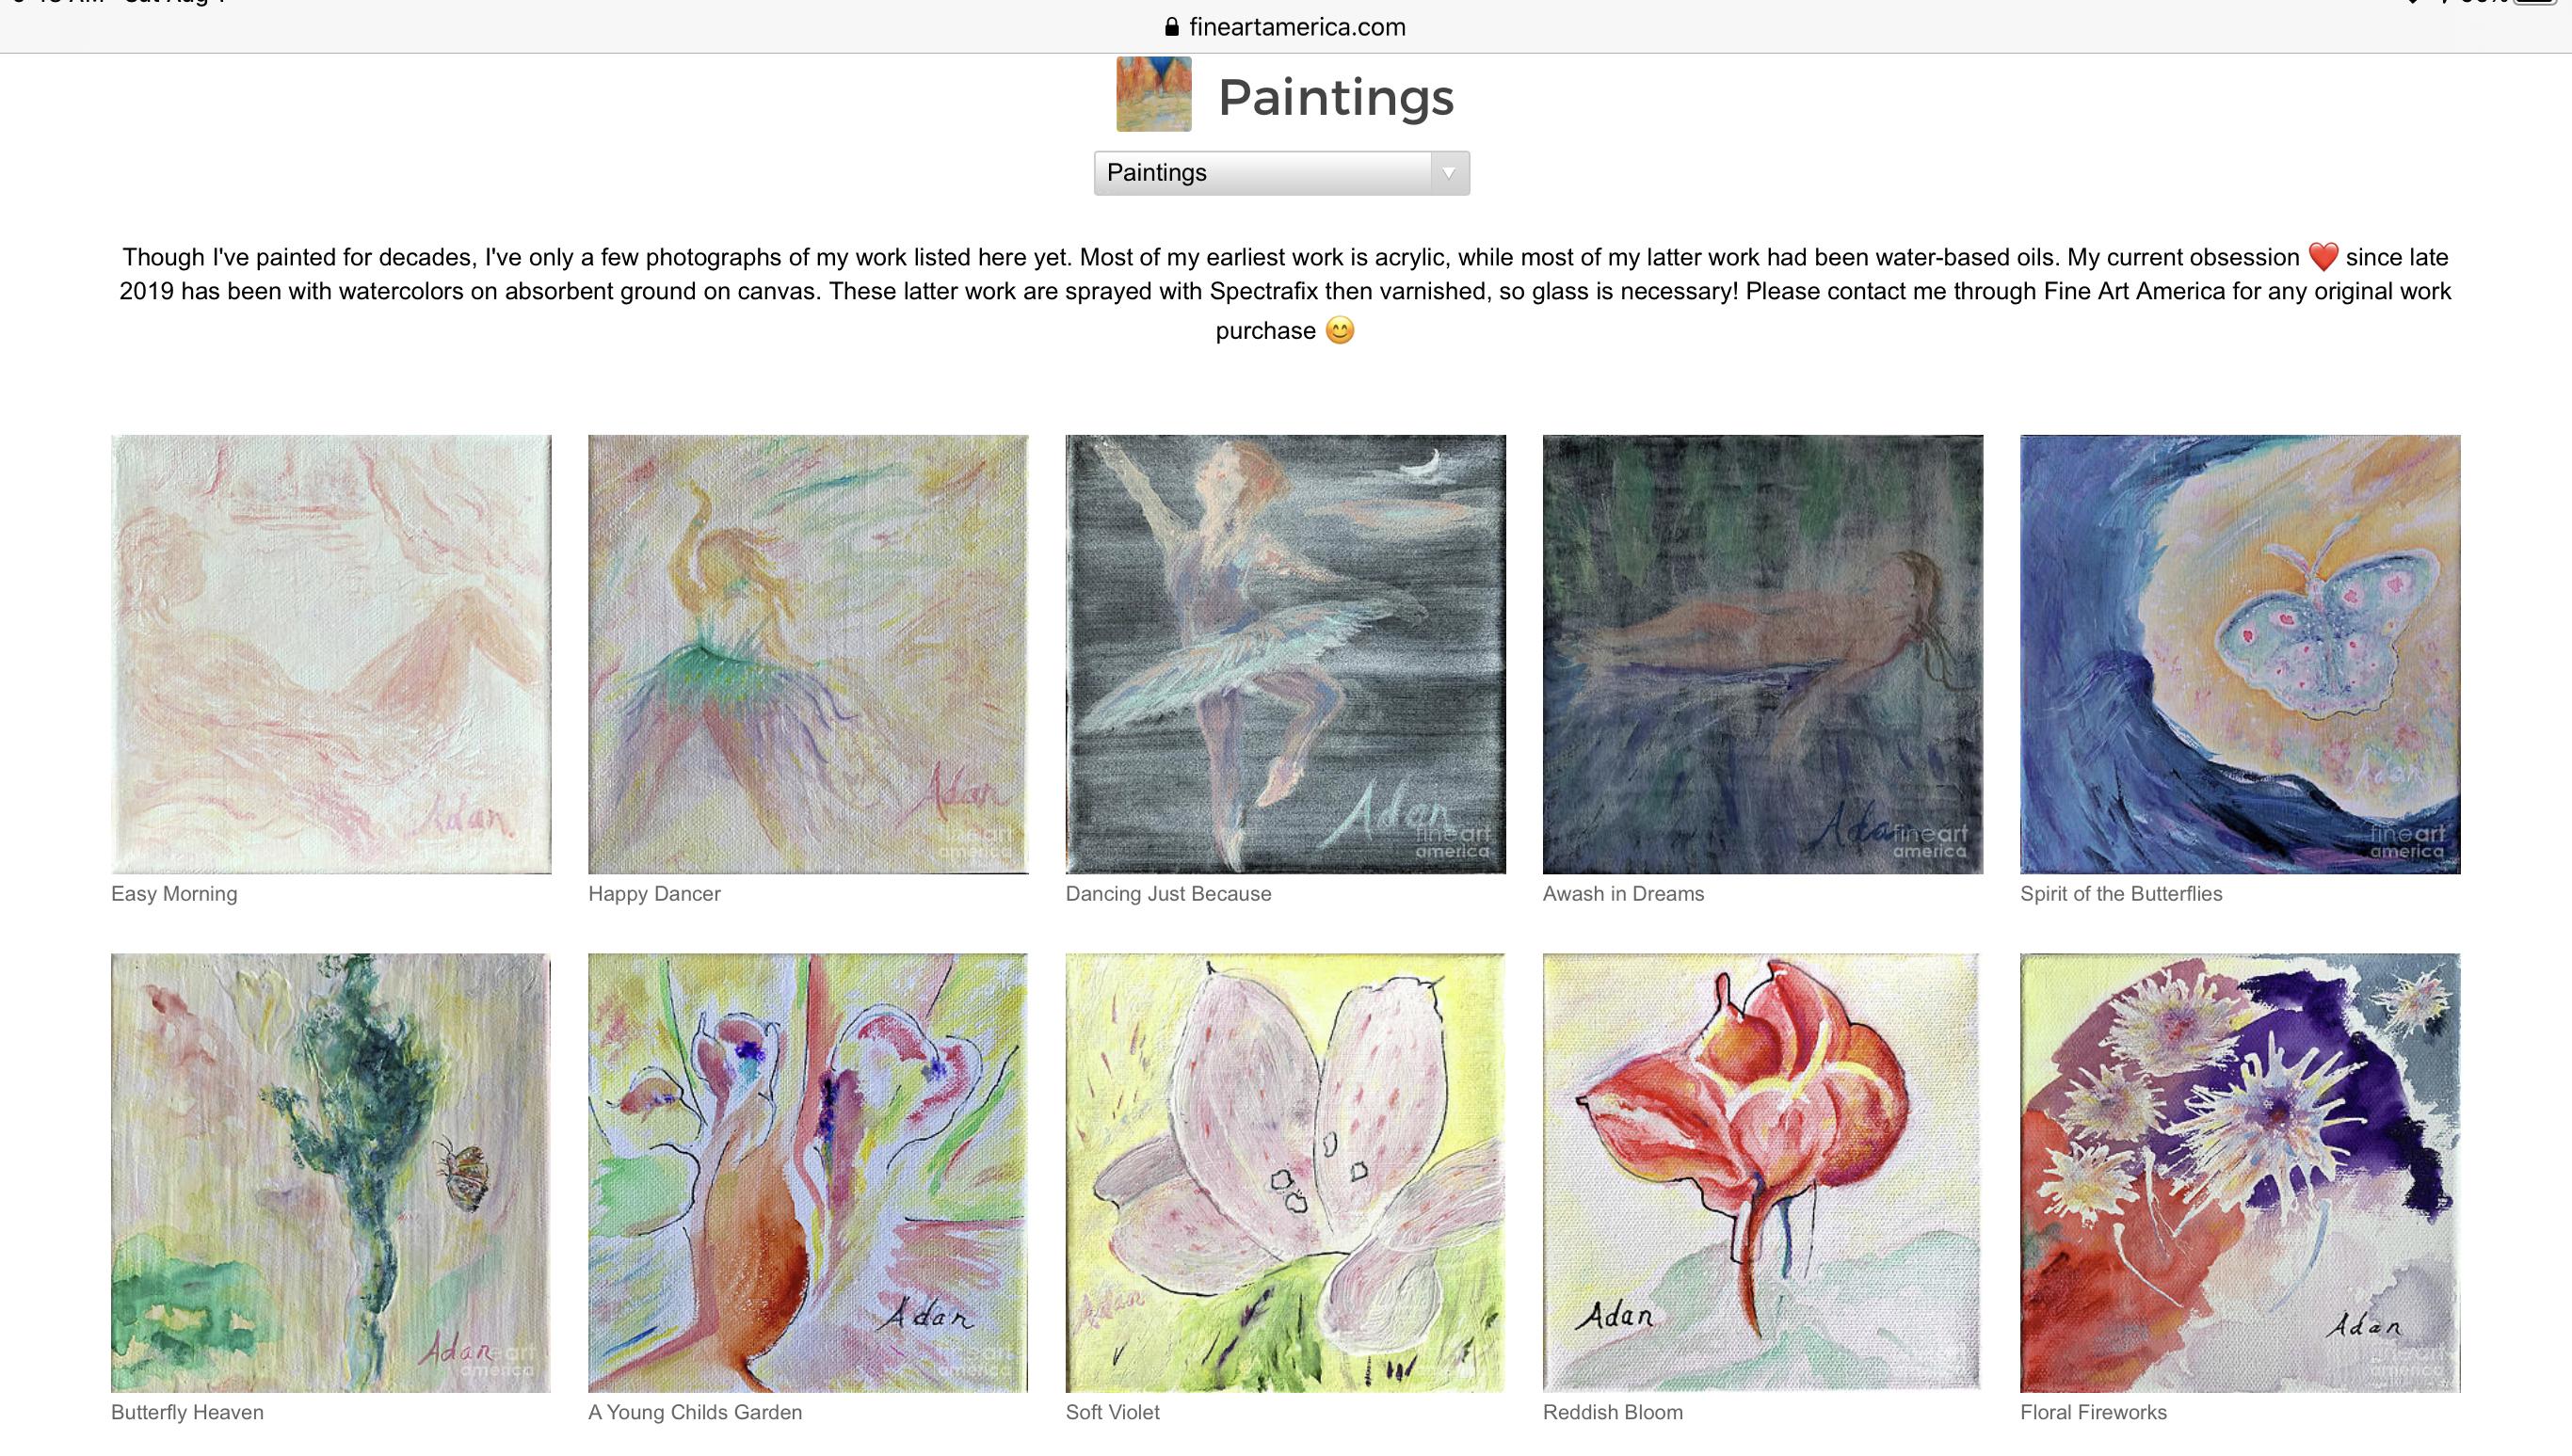 Sample Paintings by Felipe Adan Lerma on Fine Art America 08.01.20 https://fineartamerica.com/profiles/felipeadan-lerma?tab=artworkgalleries&artworkgalleryid=702859